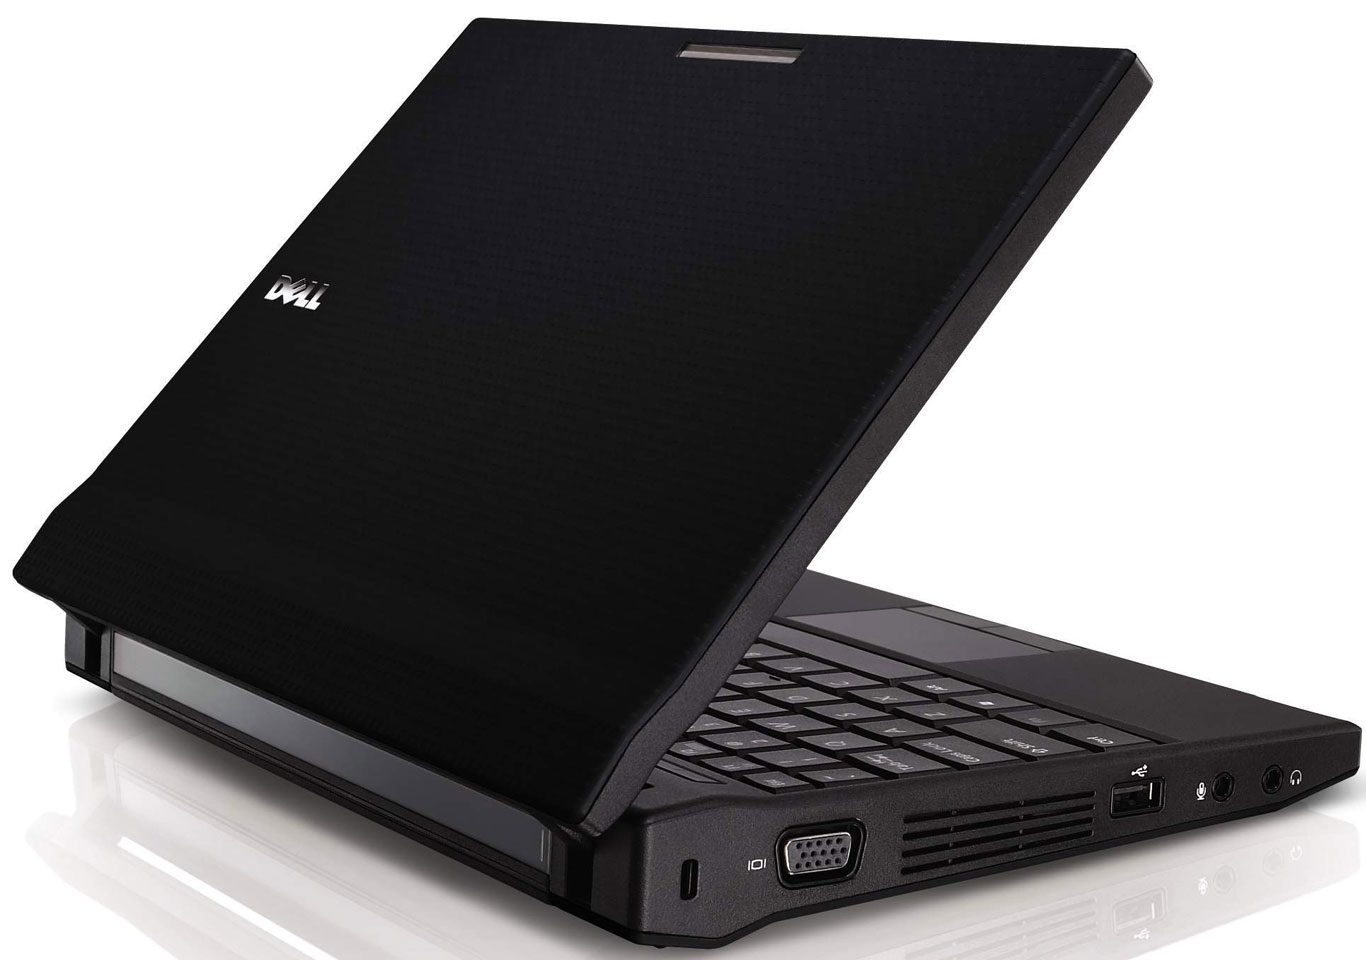 http://1.bp.blogspot.com/-CkA_N3nO6e0/T6RbST6L6TI/AAAAAAAAAqY/kjdmPninTIM/s1600/Dell+Latitude+2120+Review.jpg